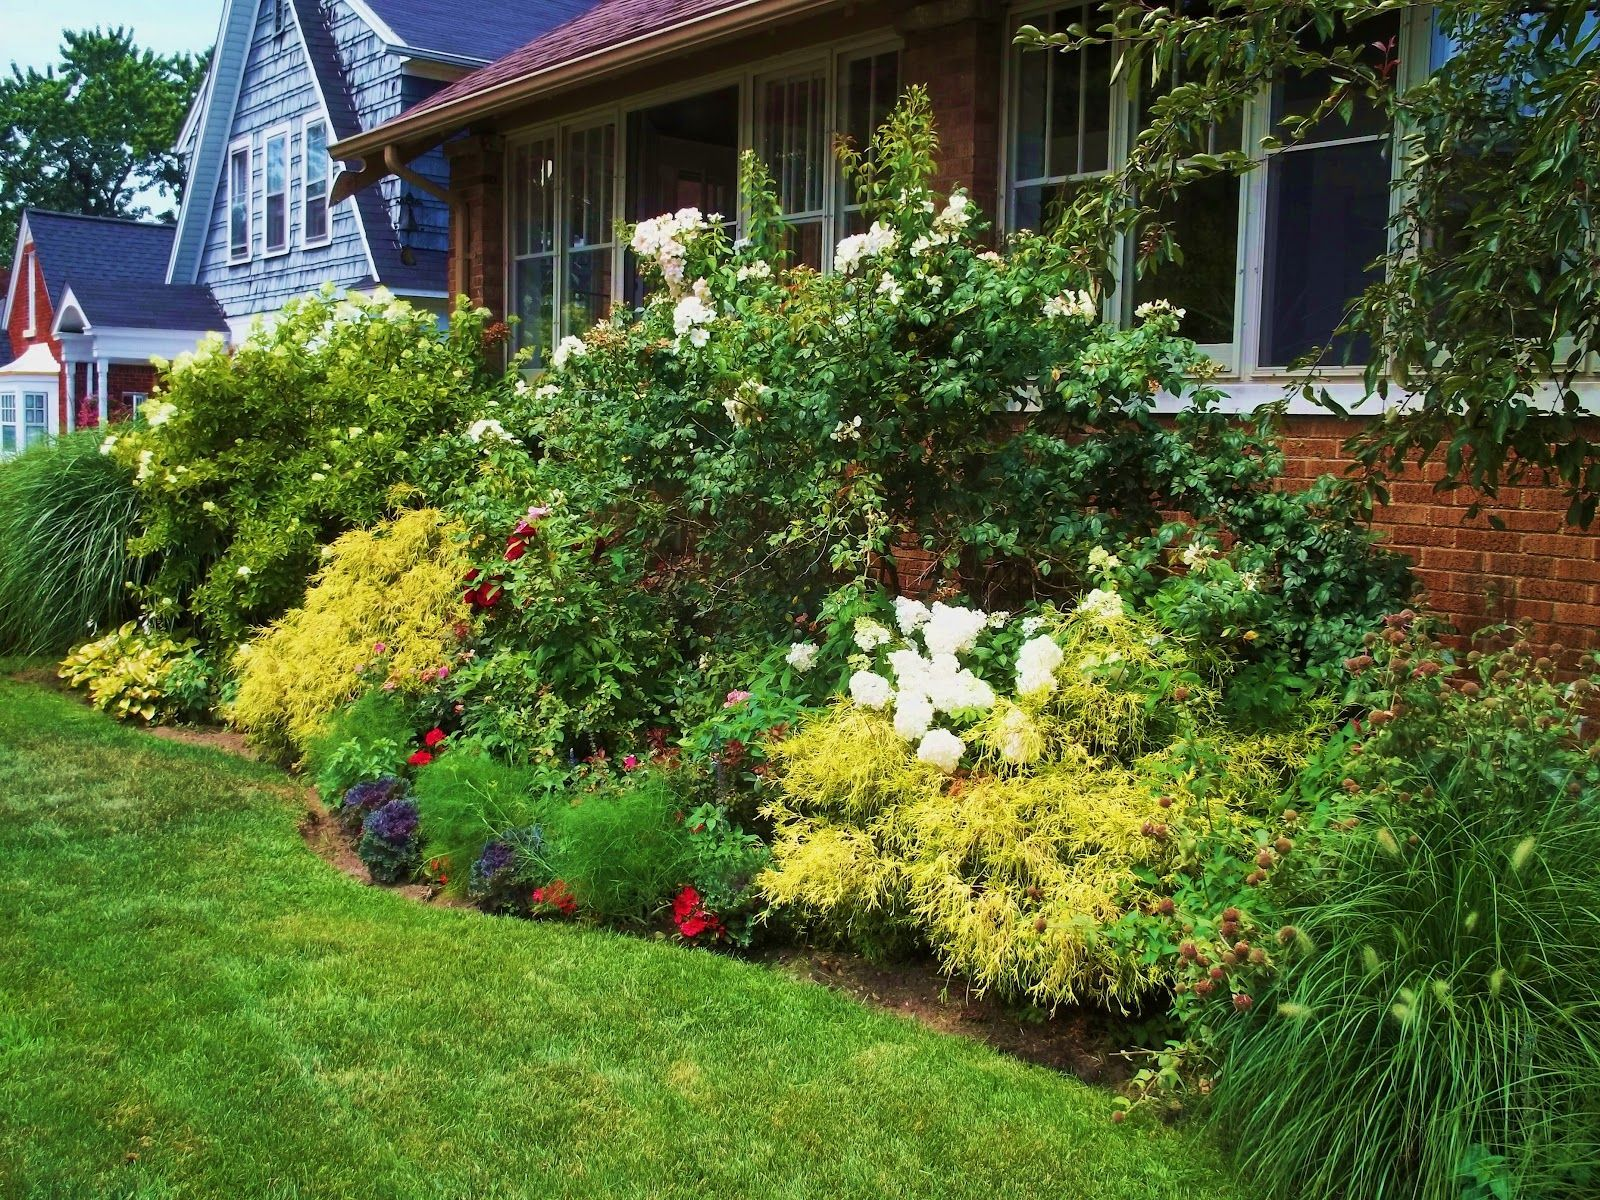 15 Fantastic Urban Backyard Garden Ideas In 2020 Cottage Garden Design Cottage Garden Country Cottage Garden